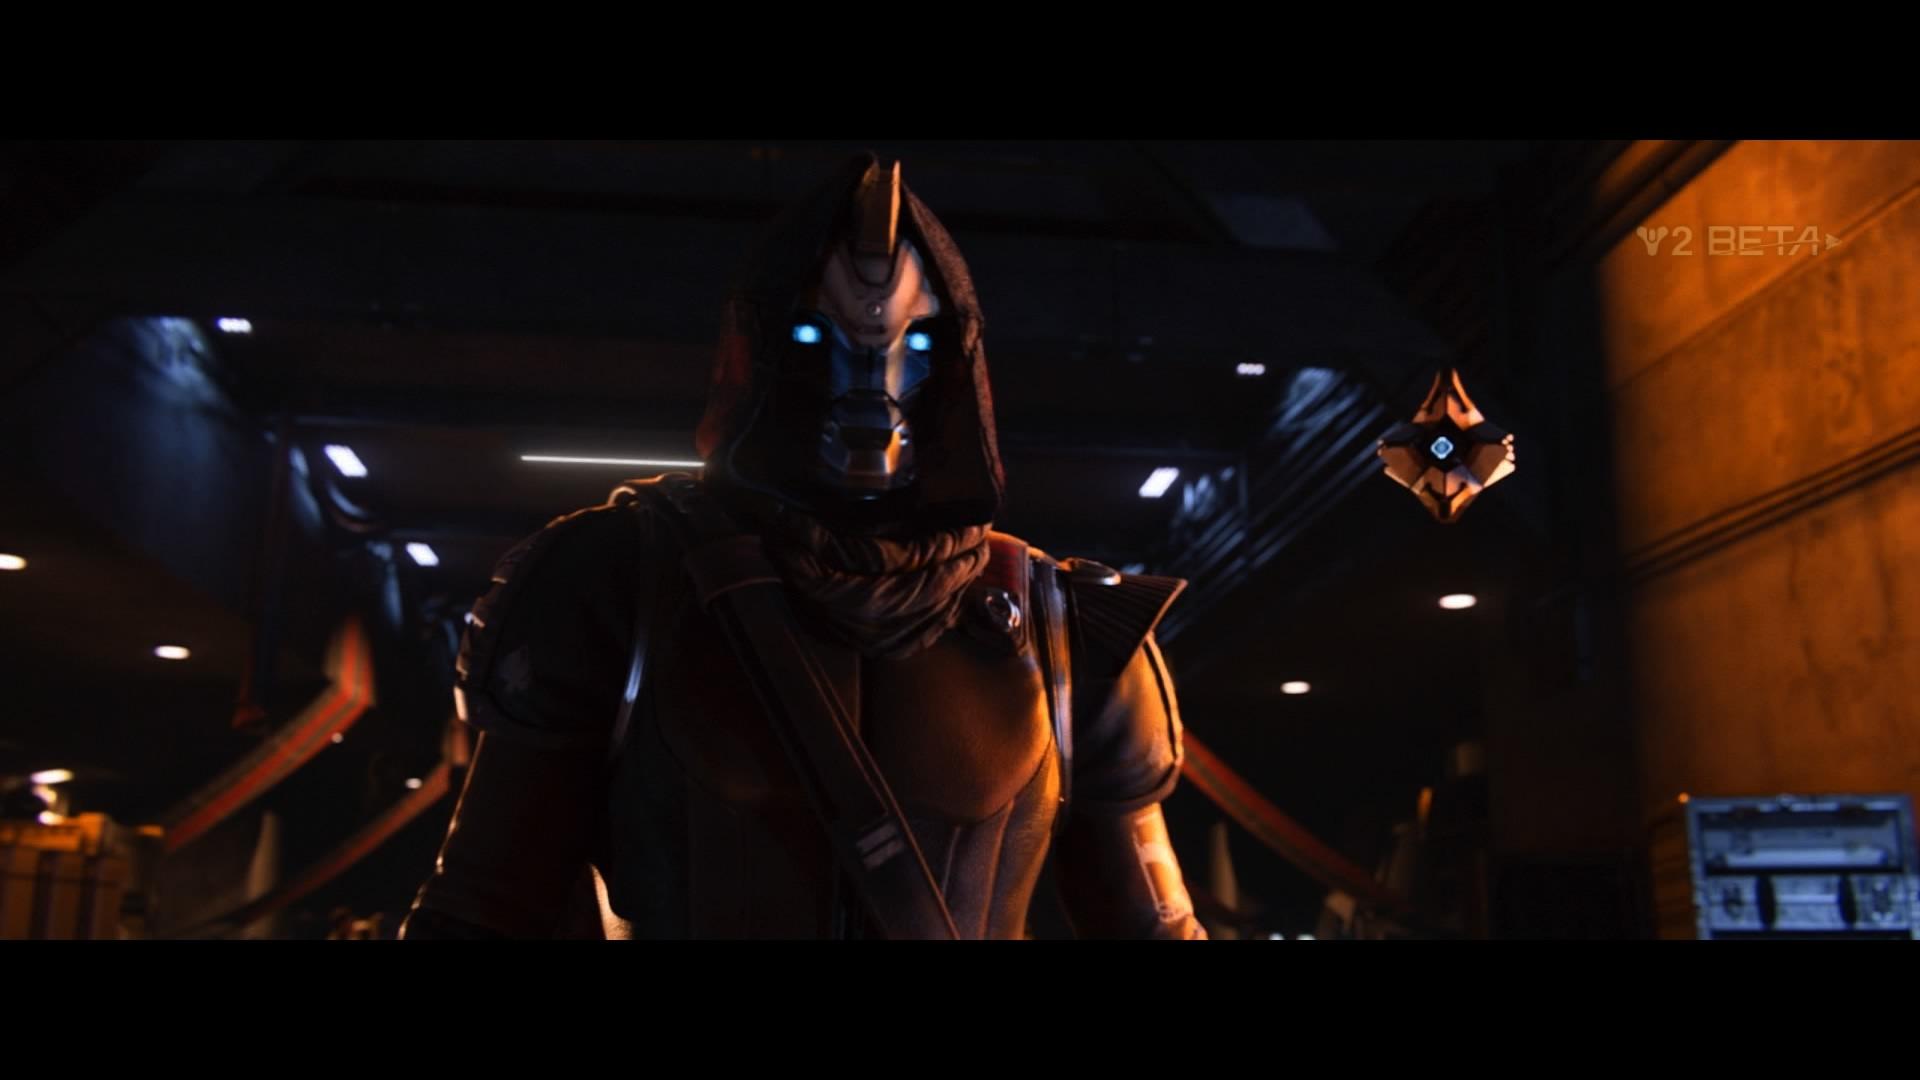 Destiny 2 Beta - Cayde 6